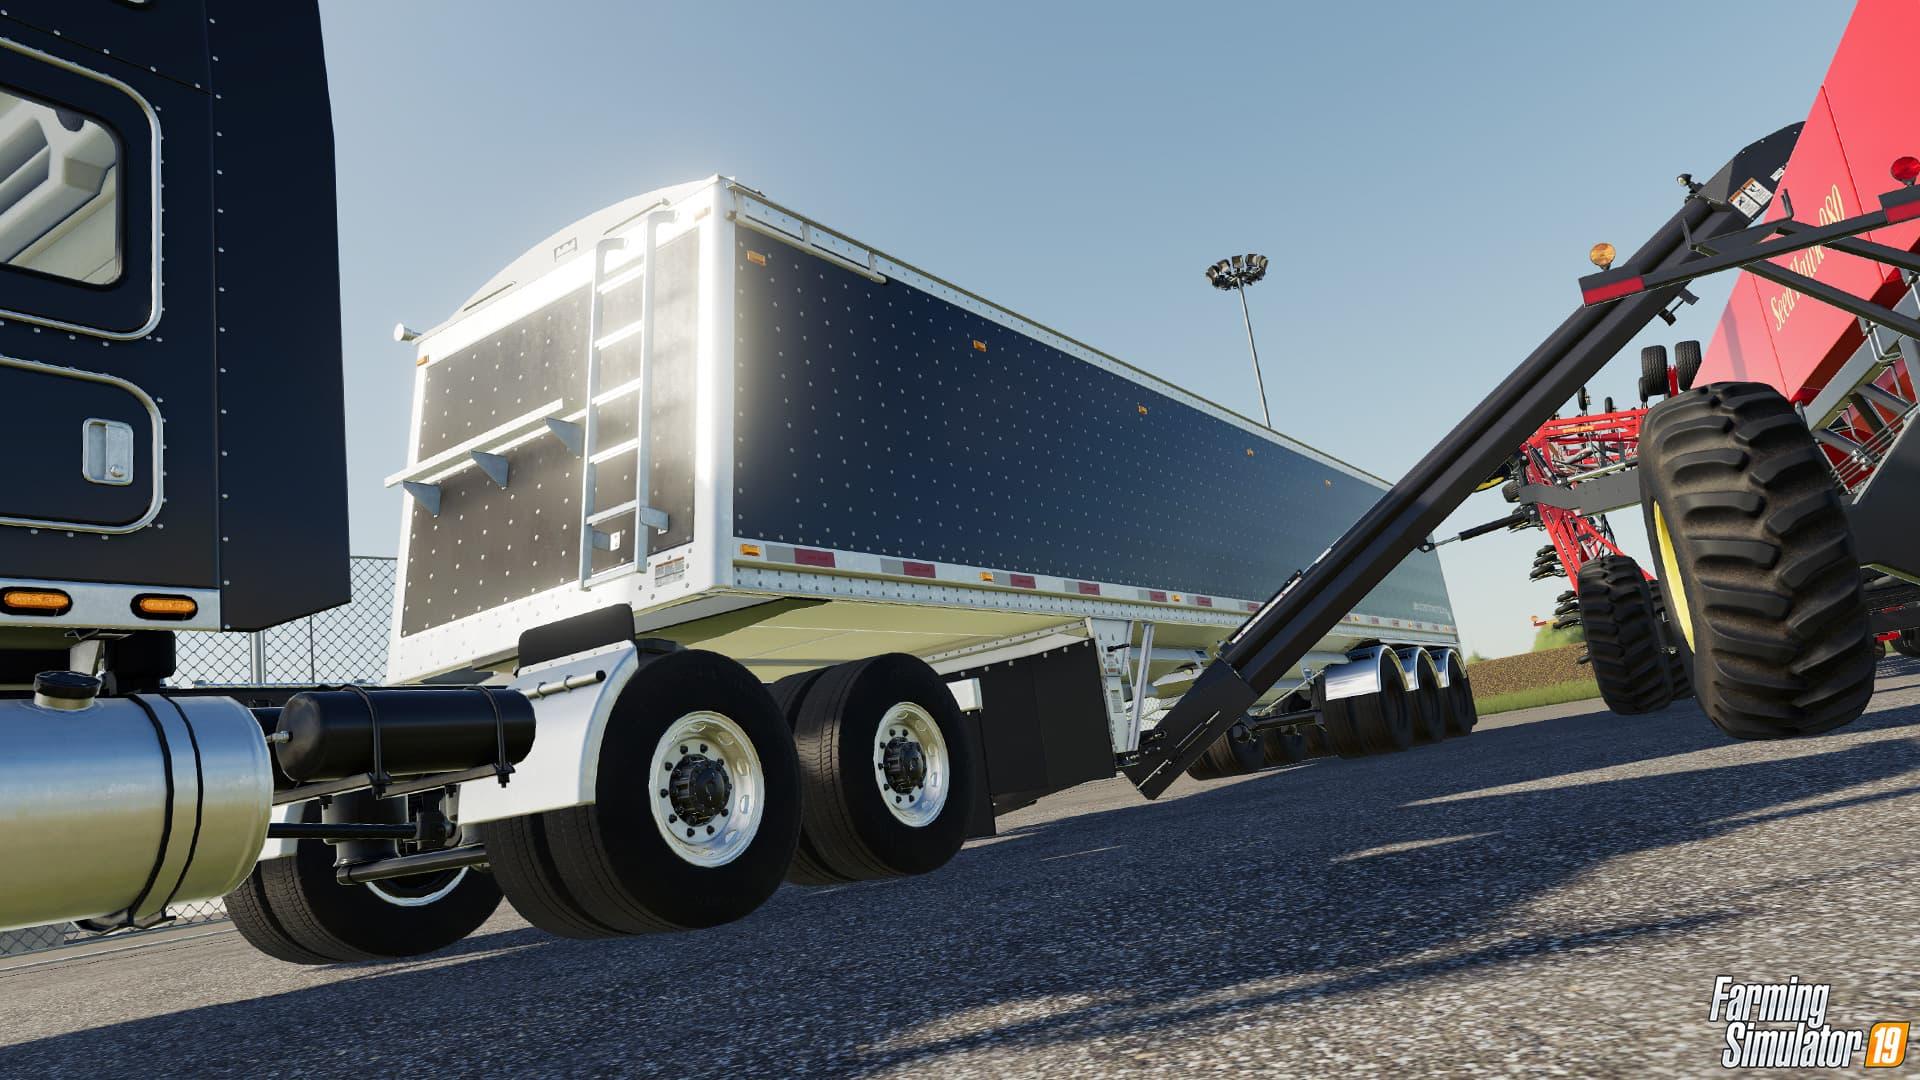 Lode King comes to Farming Simulator 19 - Lode King